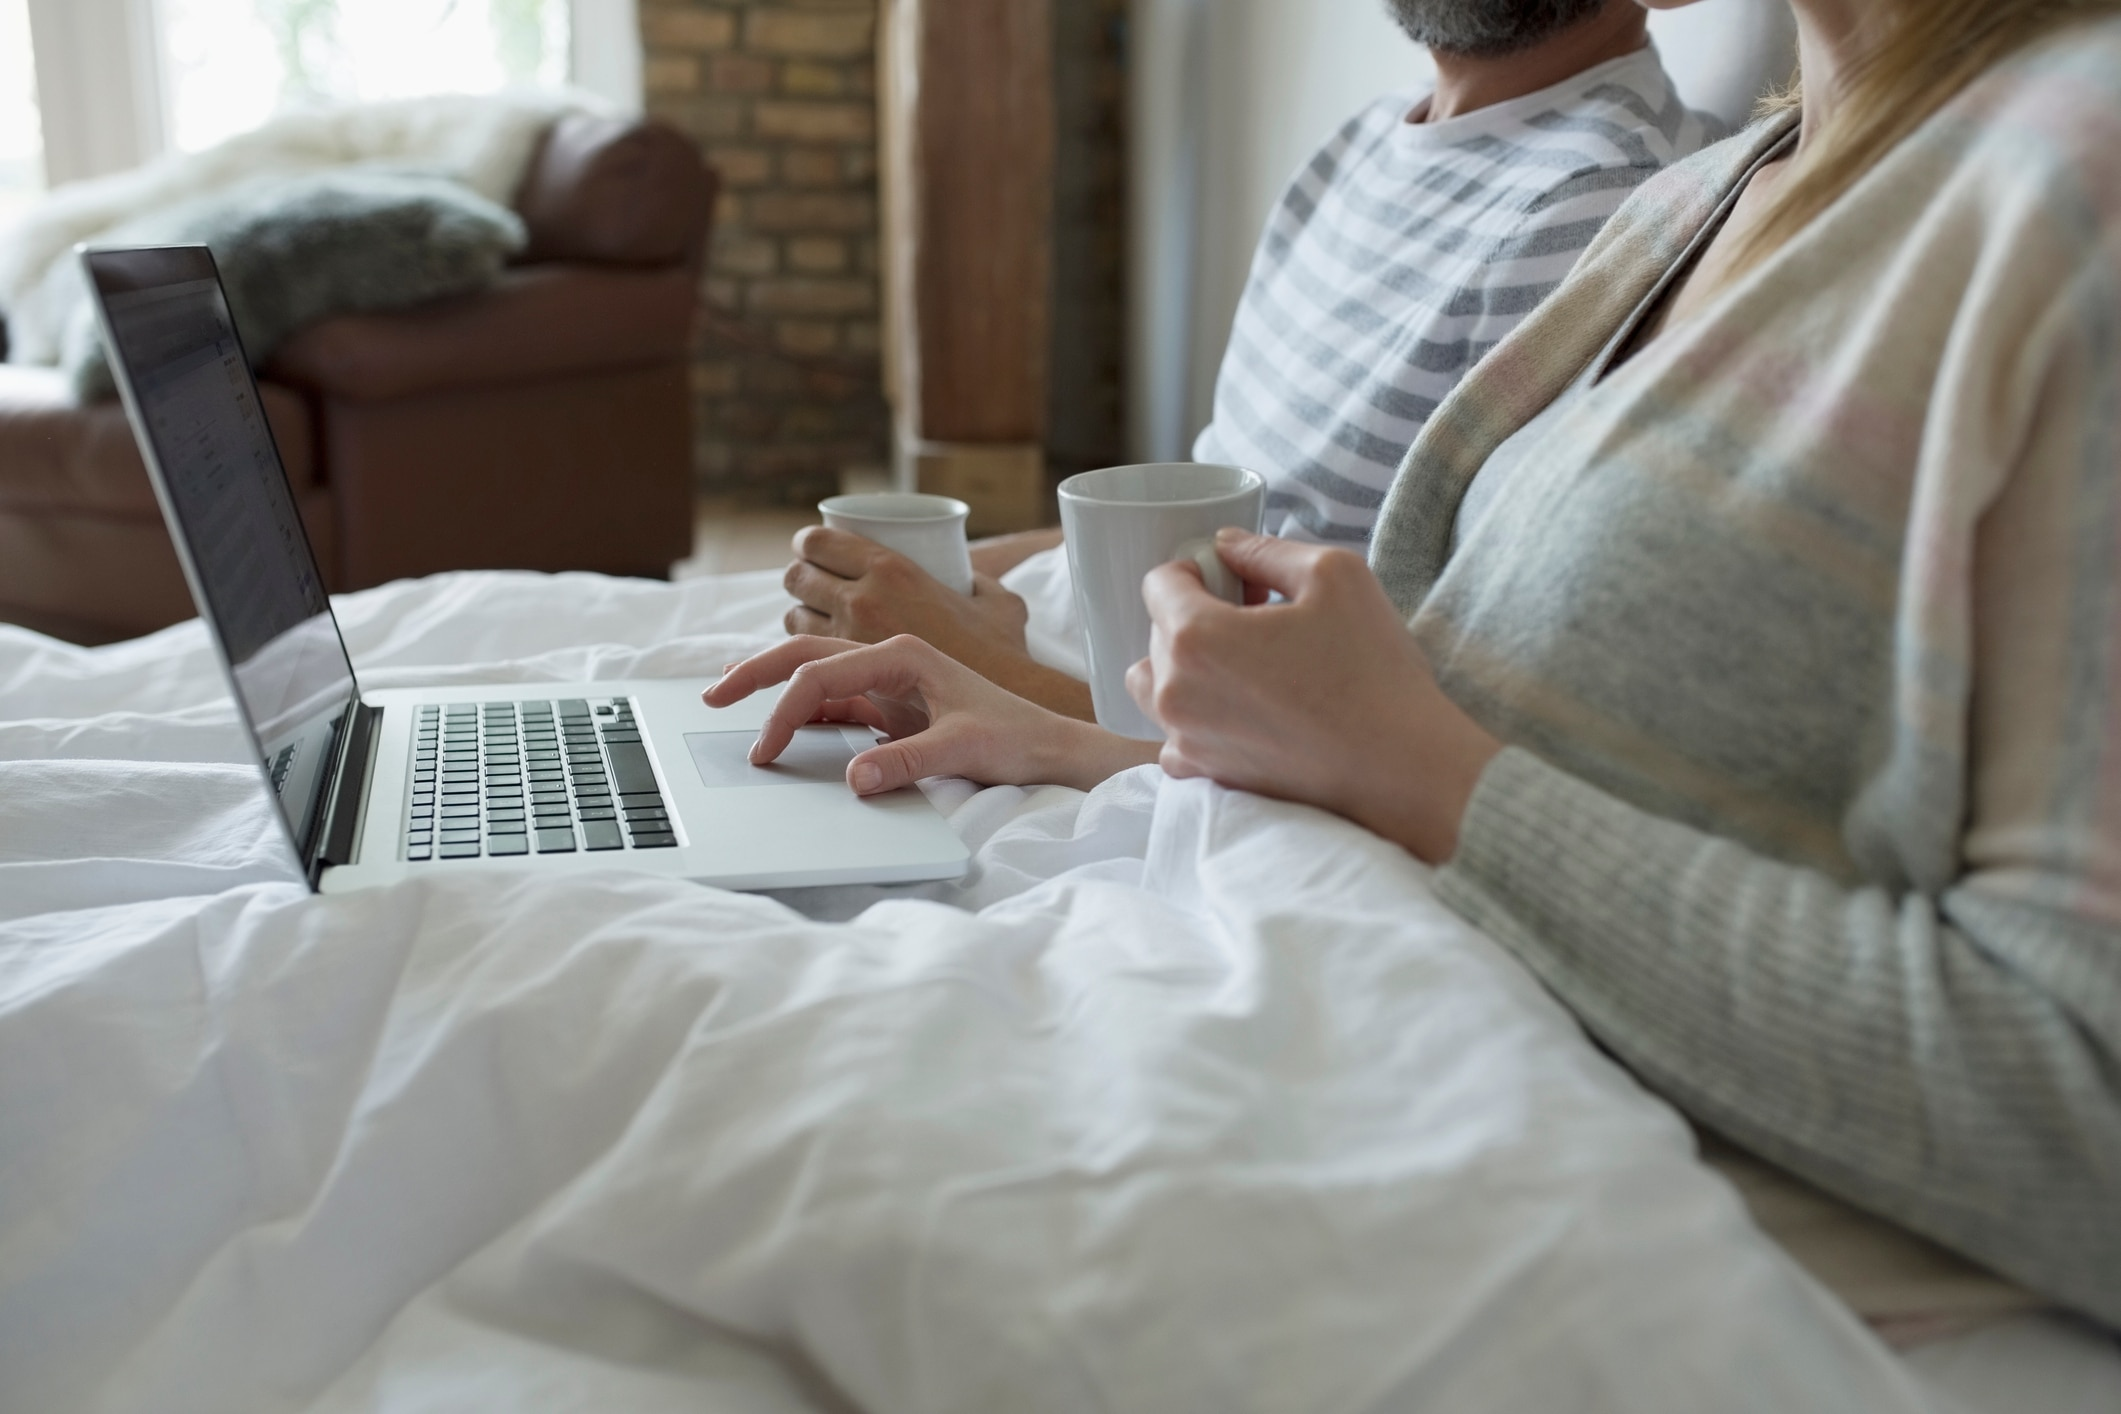 wie funktioniert mesh wlan techbook. Black Bedroom Furniture Sets. Home Design Ideas